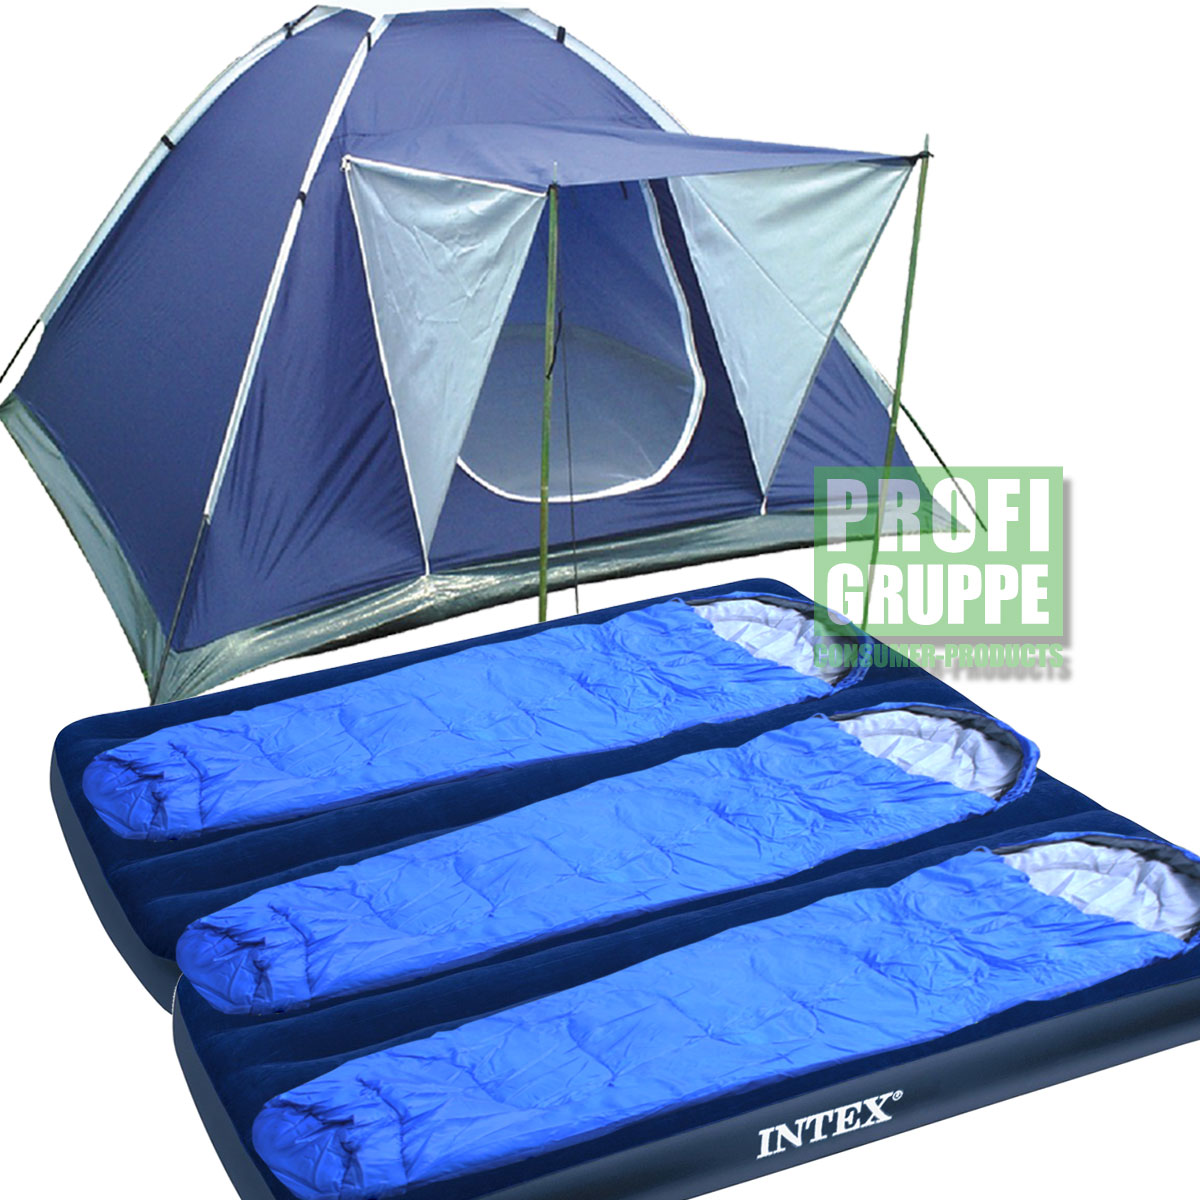 premium camping set 3 personen iglu zelt 2x intex luftbett 3x schlafsack ebay. Black Bedroom Furniture Sets. Home Design Ideas